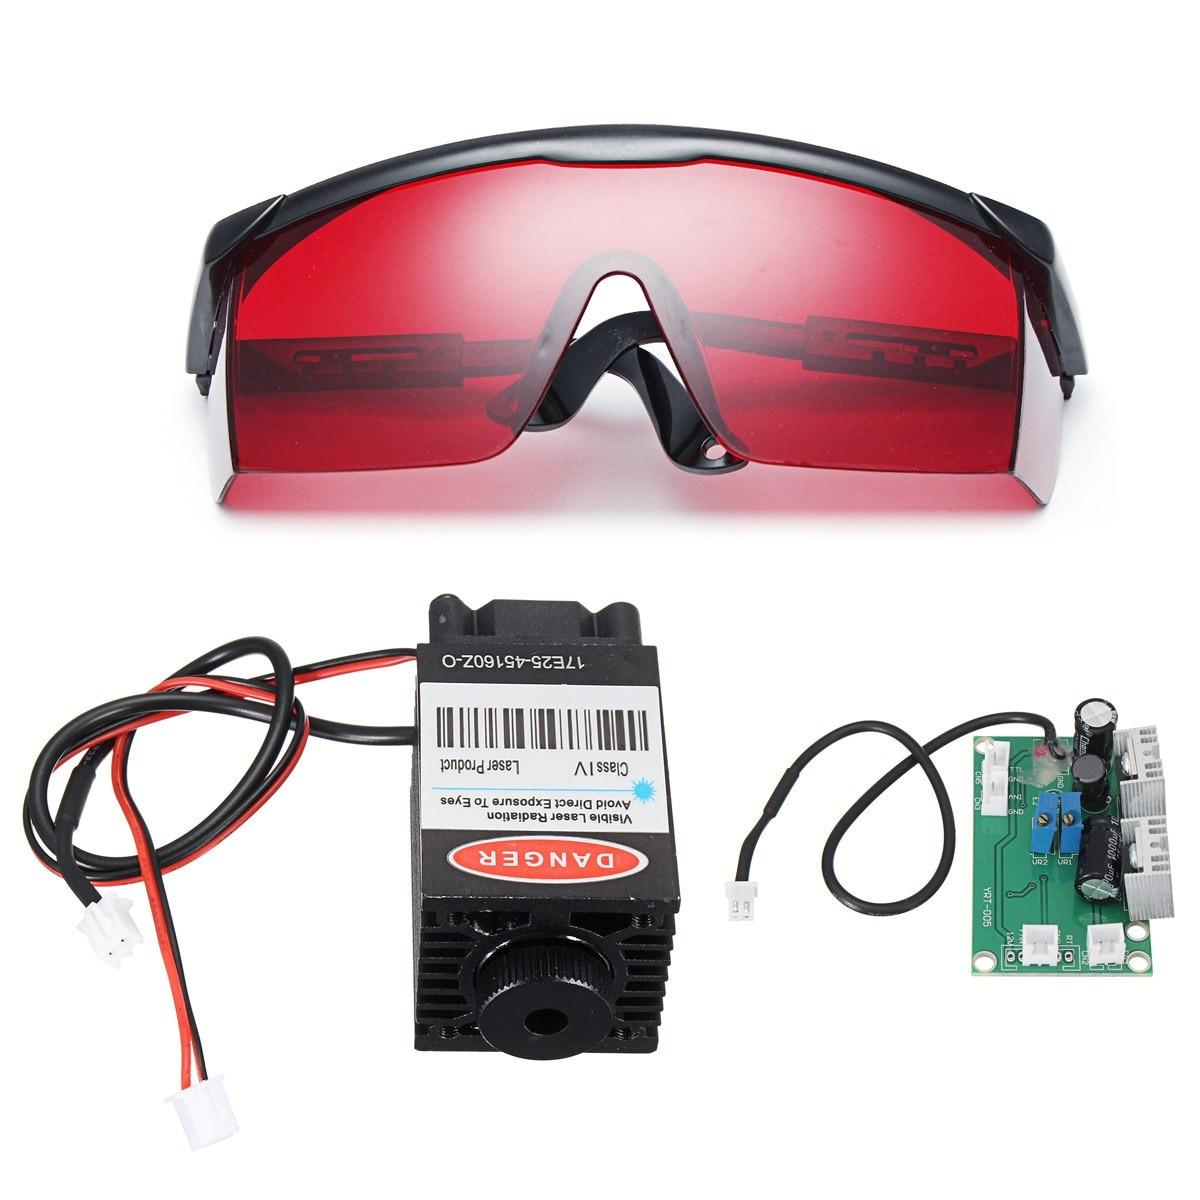 2500mW Blue Laser Head Engraving Module Marking Diode + Glasses For CNC Engraver